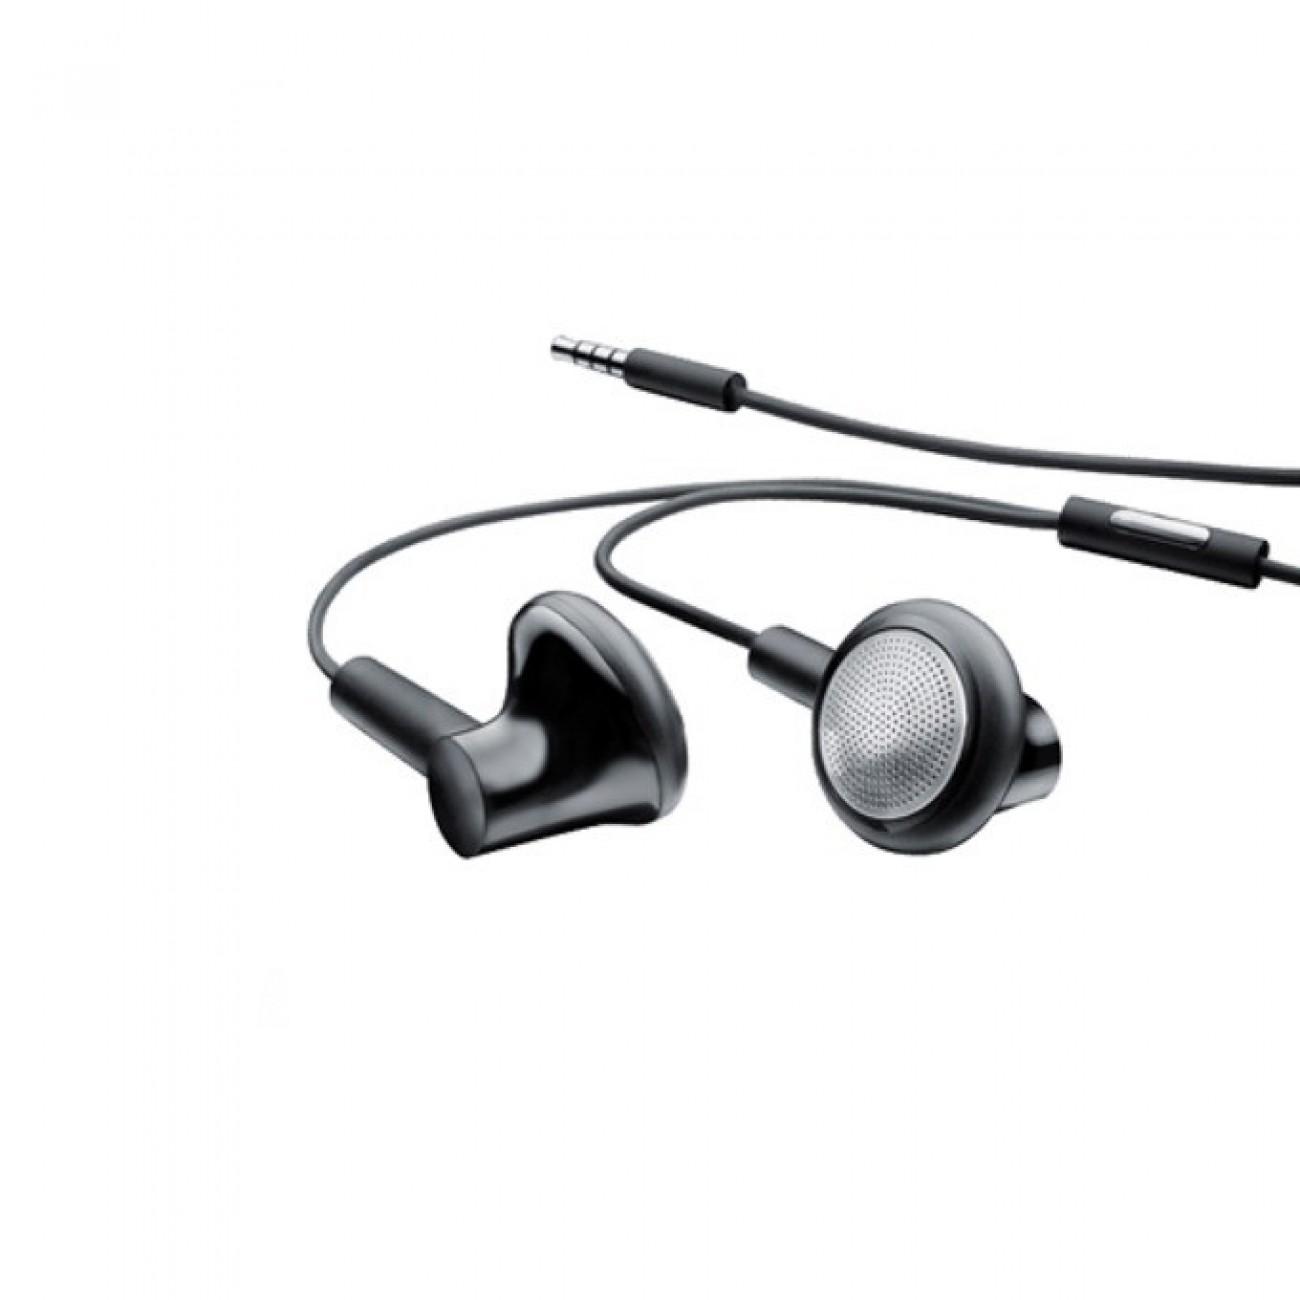 Слушалки за Nokia Lumia, с микрофон, 3.5 жак, черни в Слушалки -  | Alleop